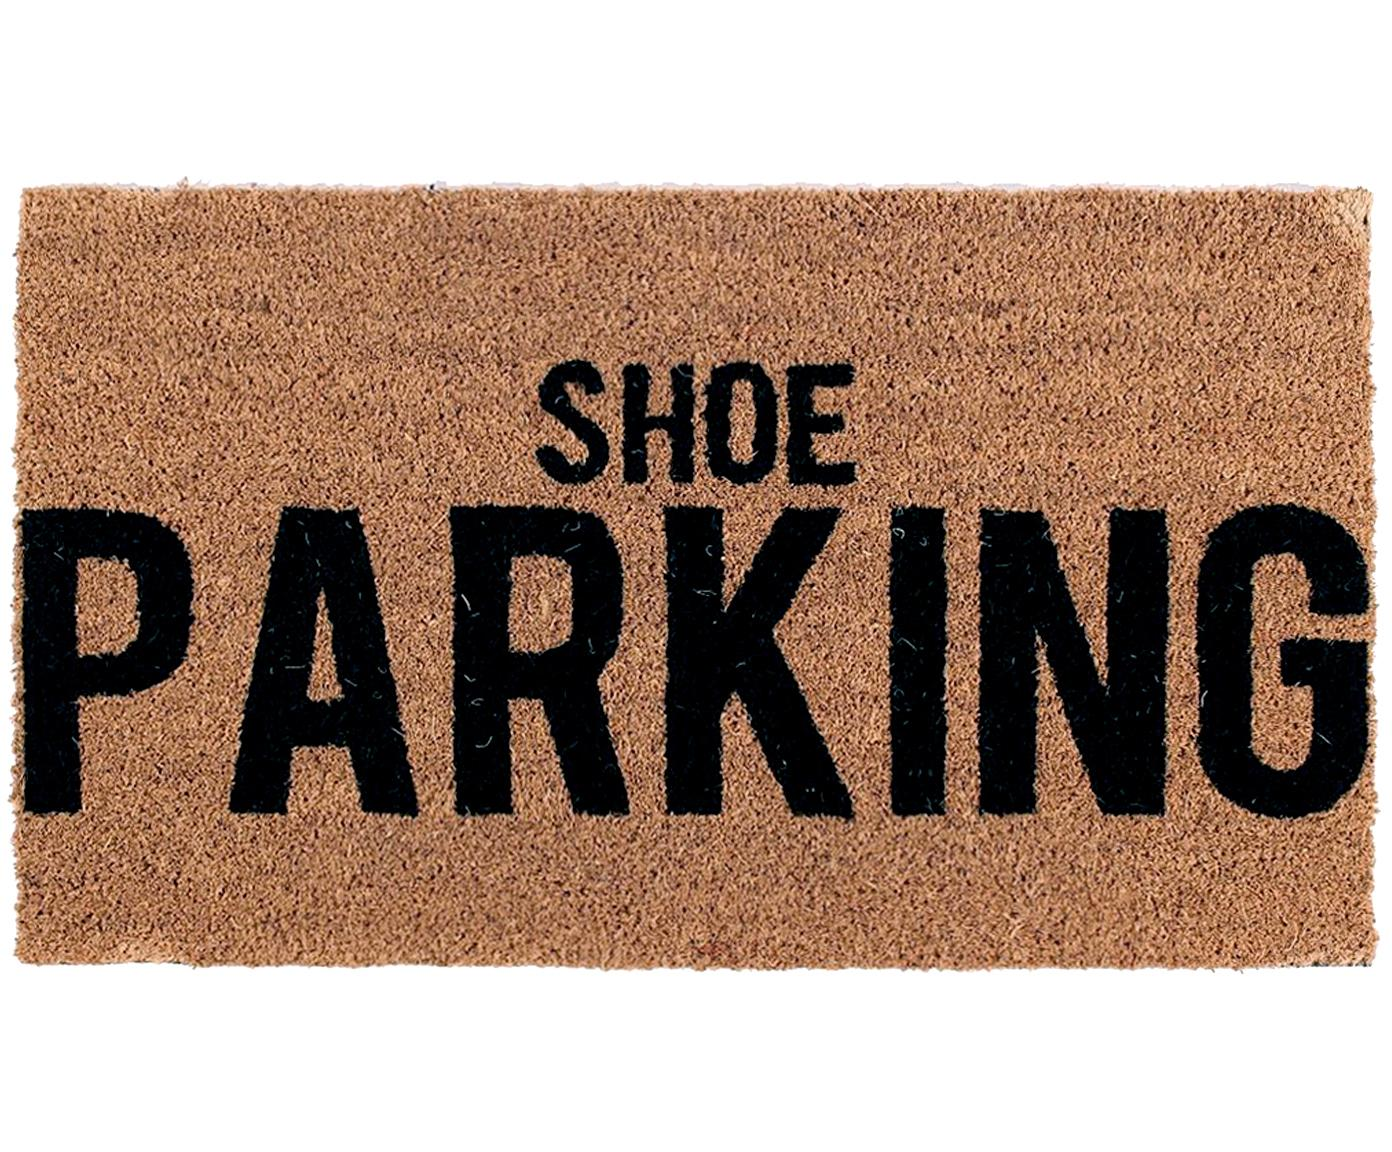 Felpudo Shoe Parking, Parte superior: fibras de coco, Reverso: PVC, Marrón, negro, An 40 x L 70 cm